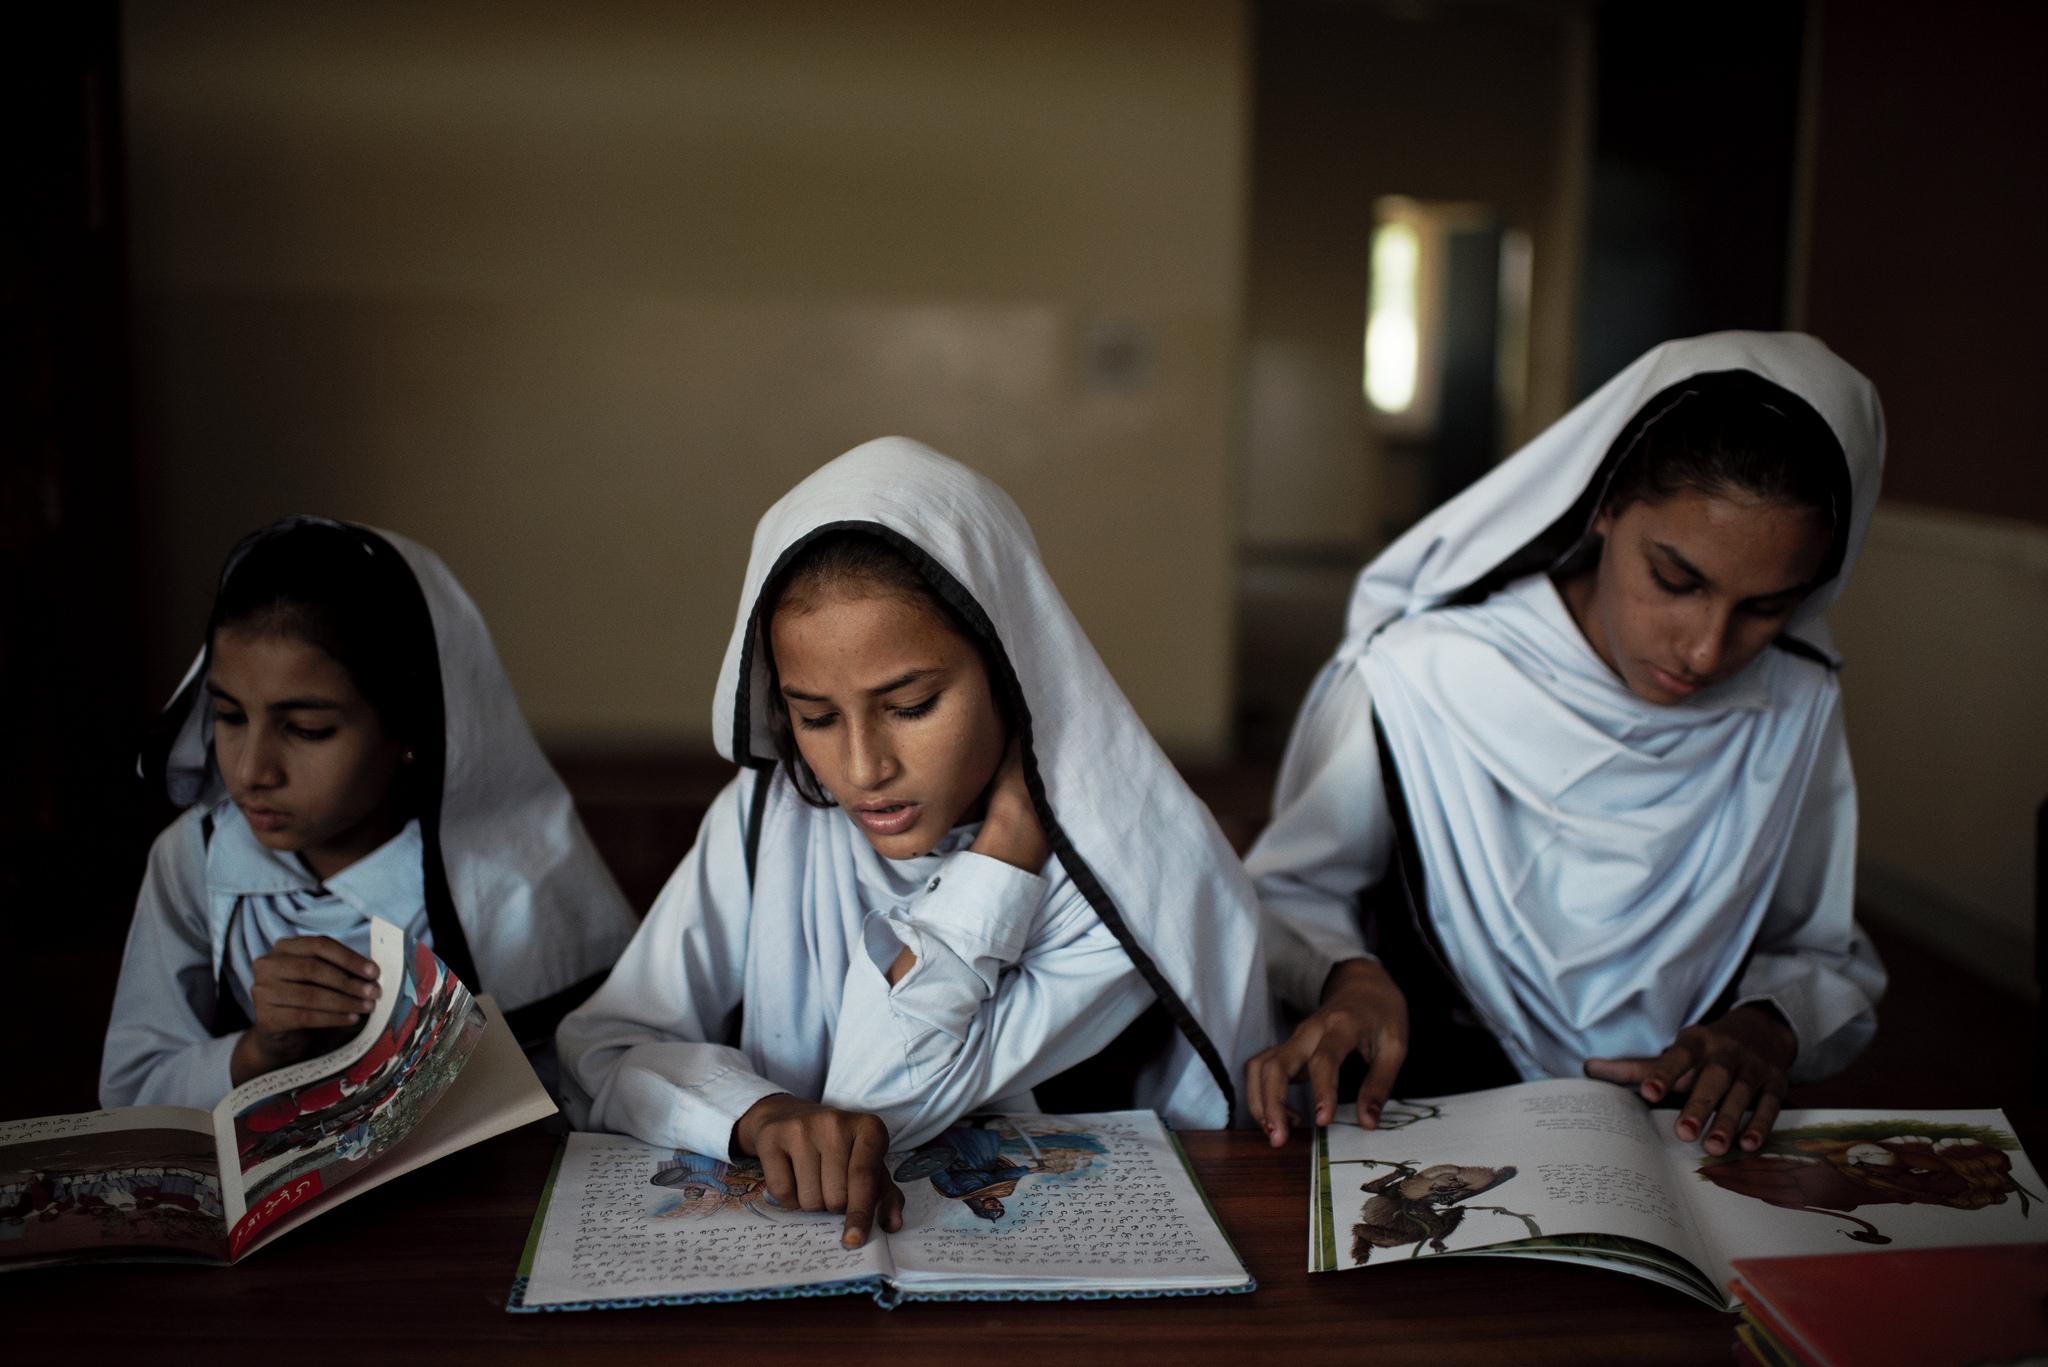 Pakistani-girls-Credit-Stars-Foundation-Kristian-Buus-LARGE